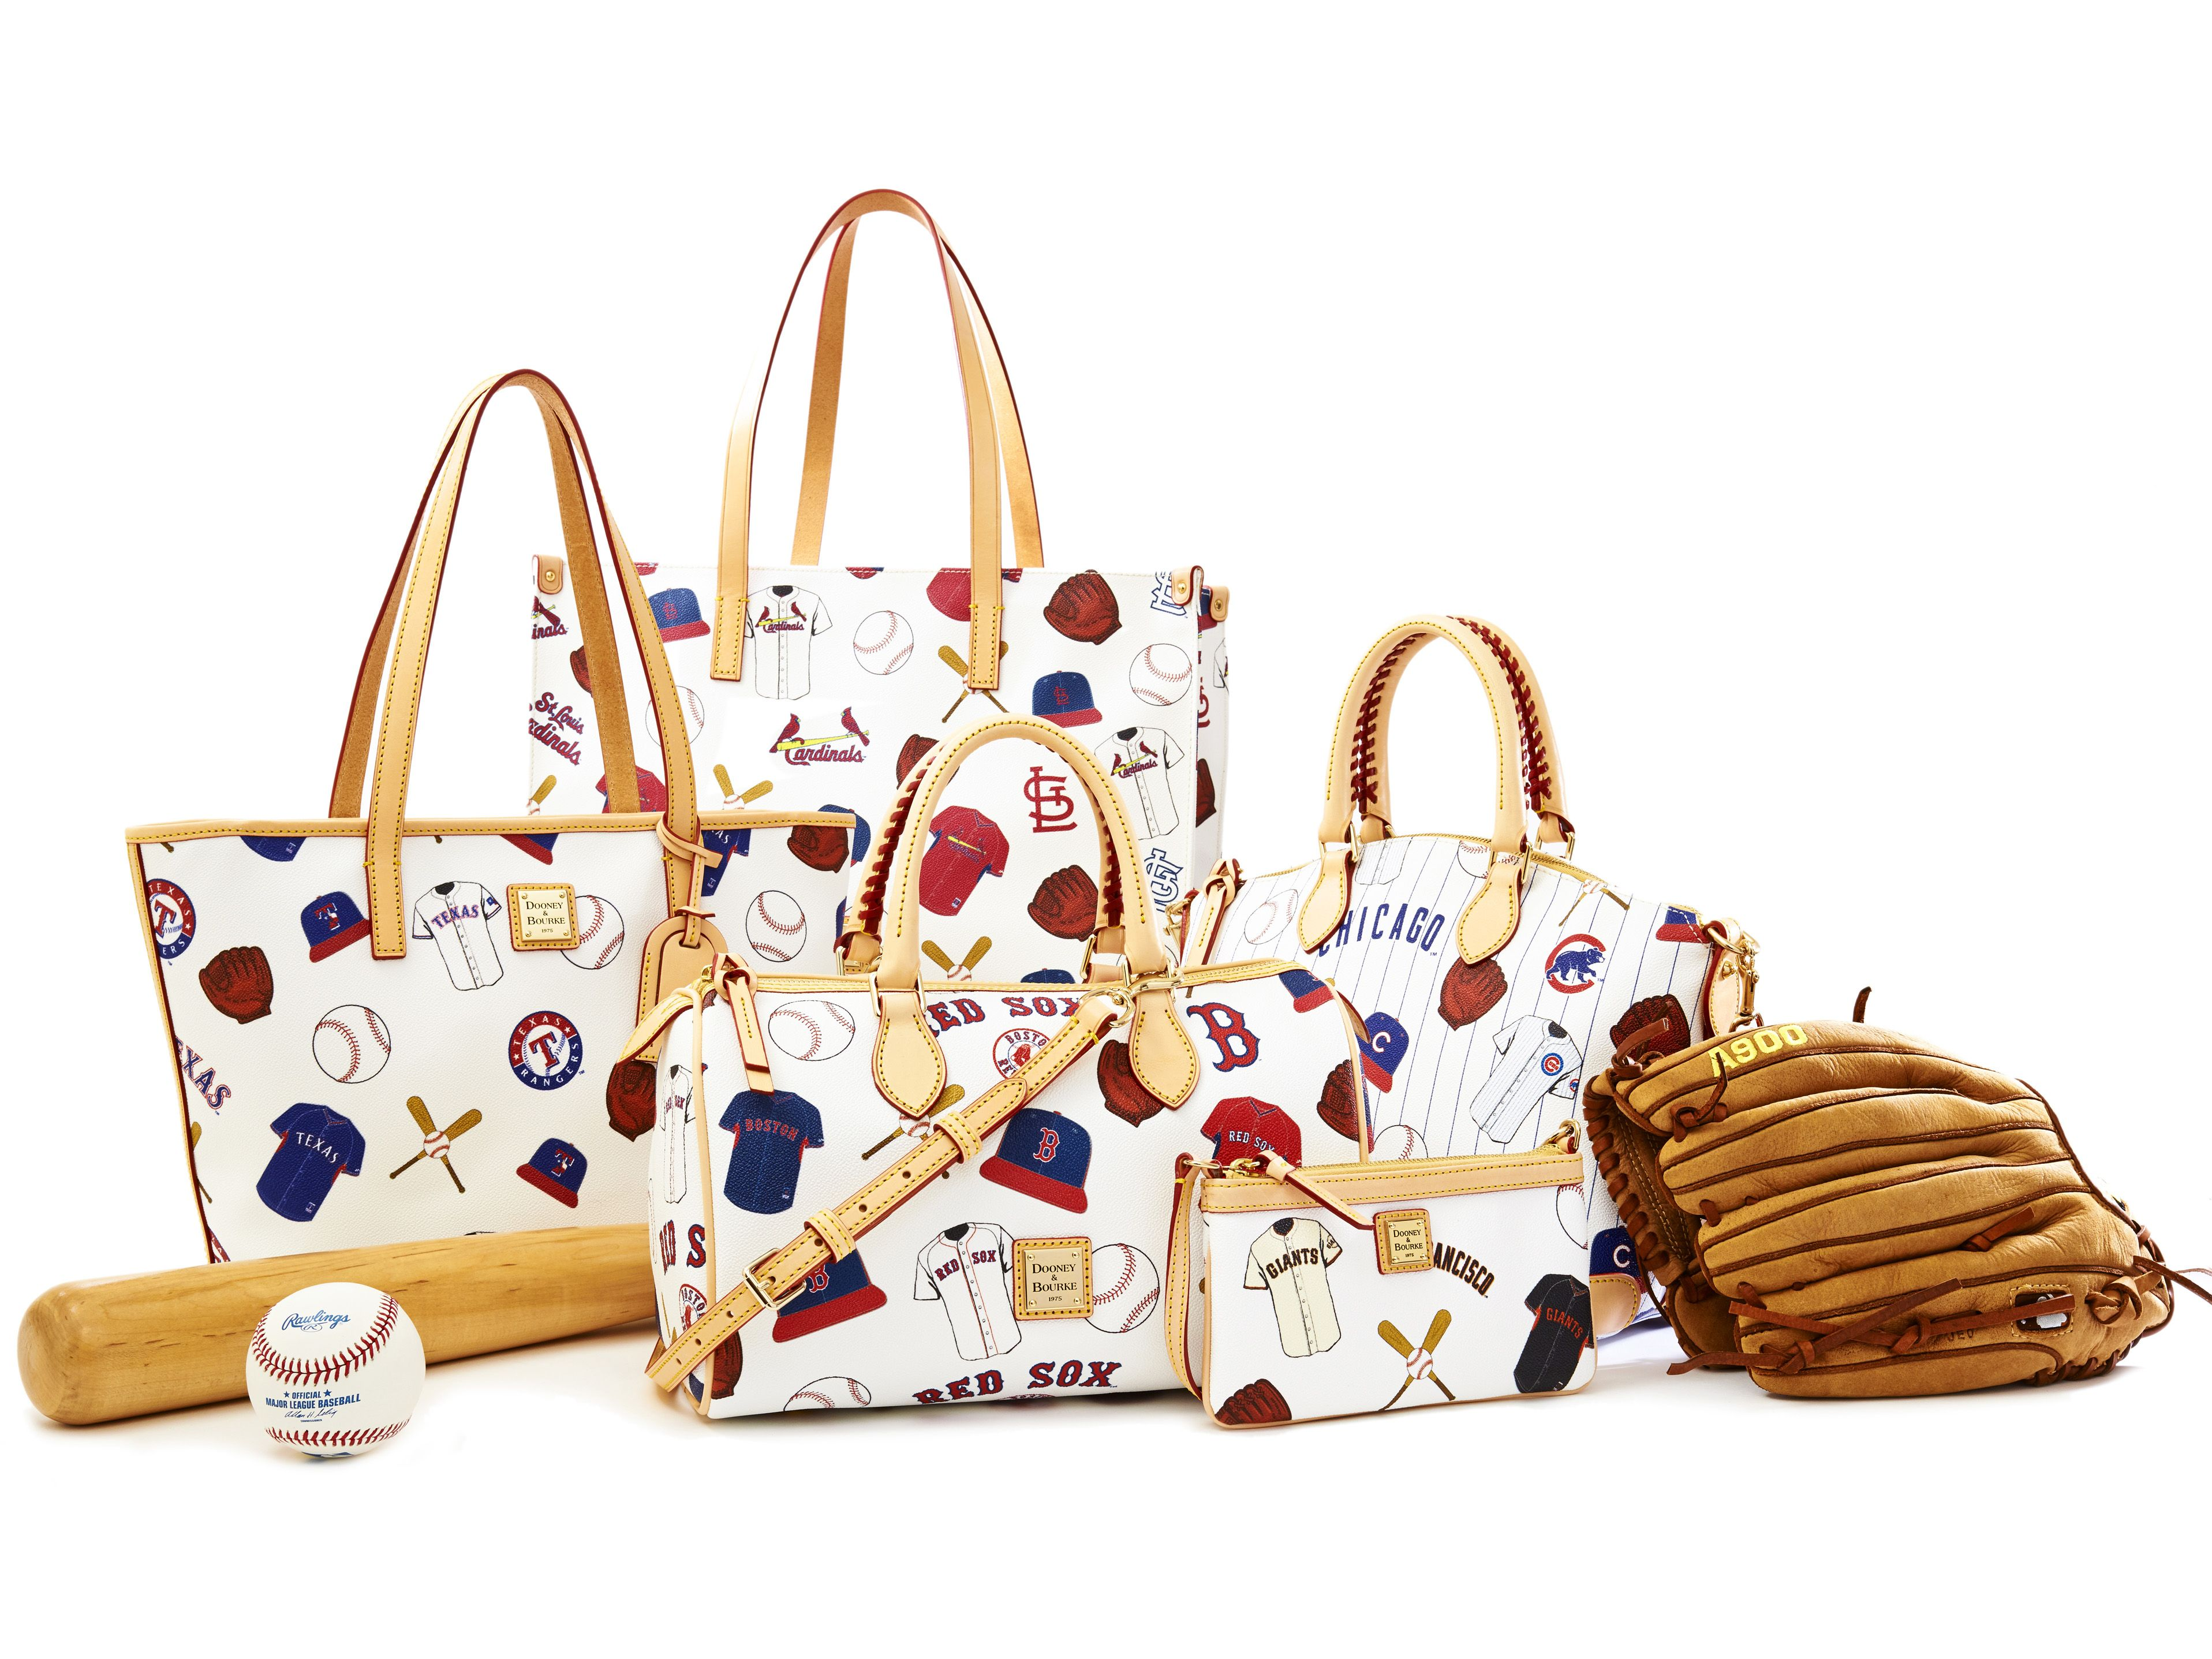 e639f7911f Introducing the Major League Baseball Collection! http://handbags.dooney.com